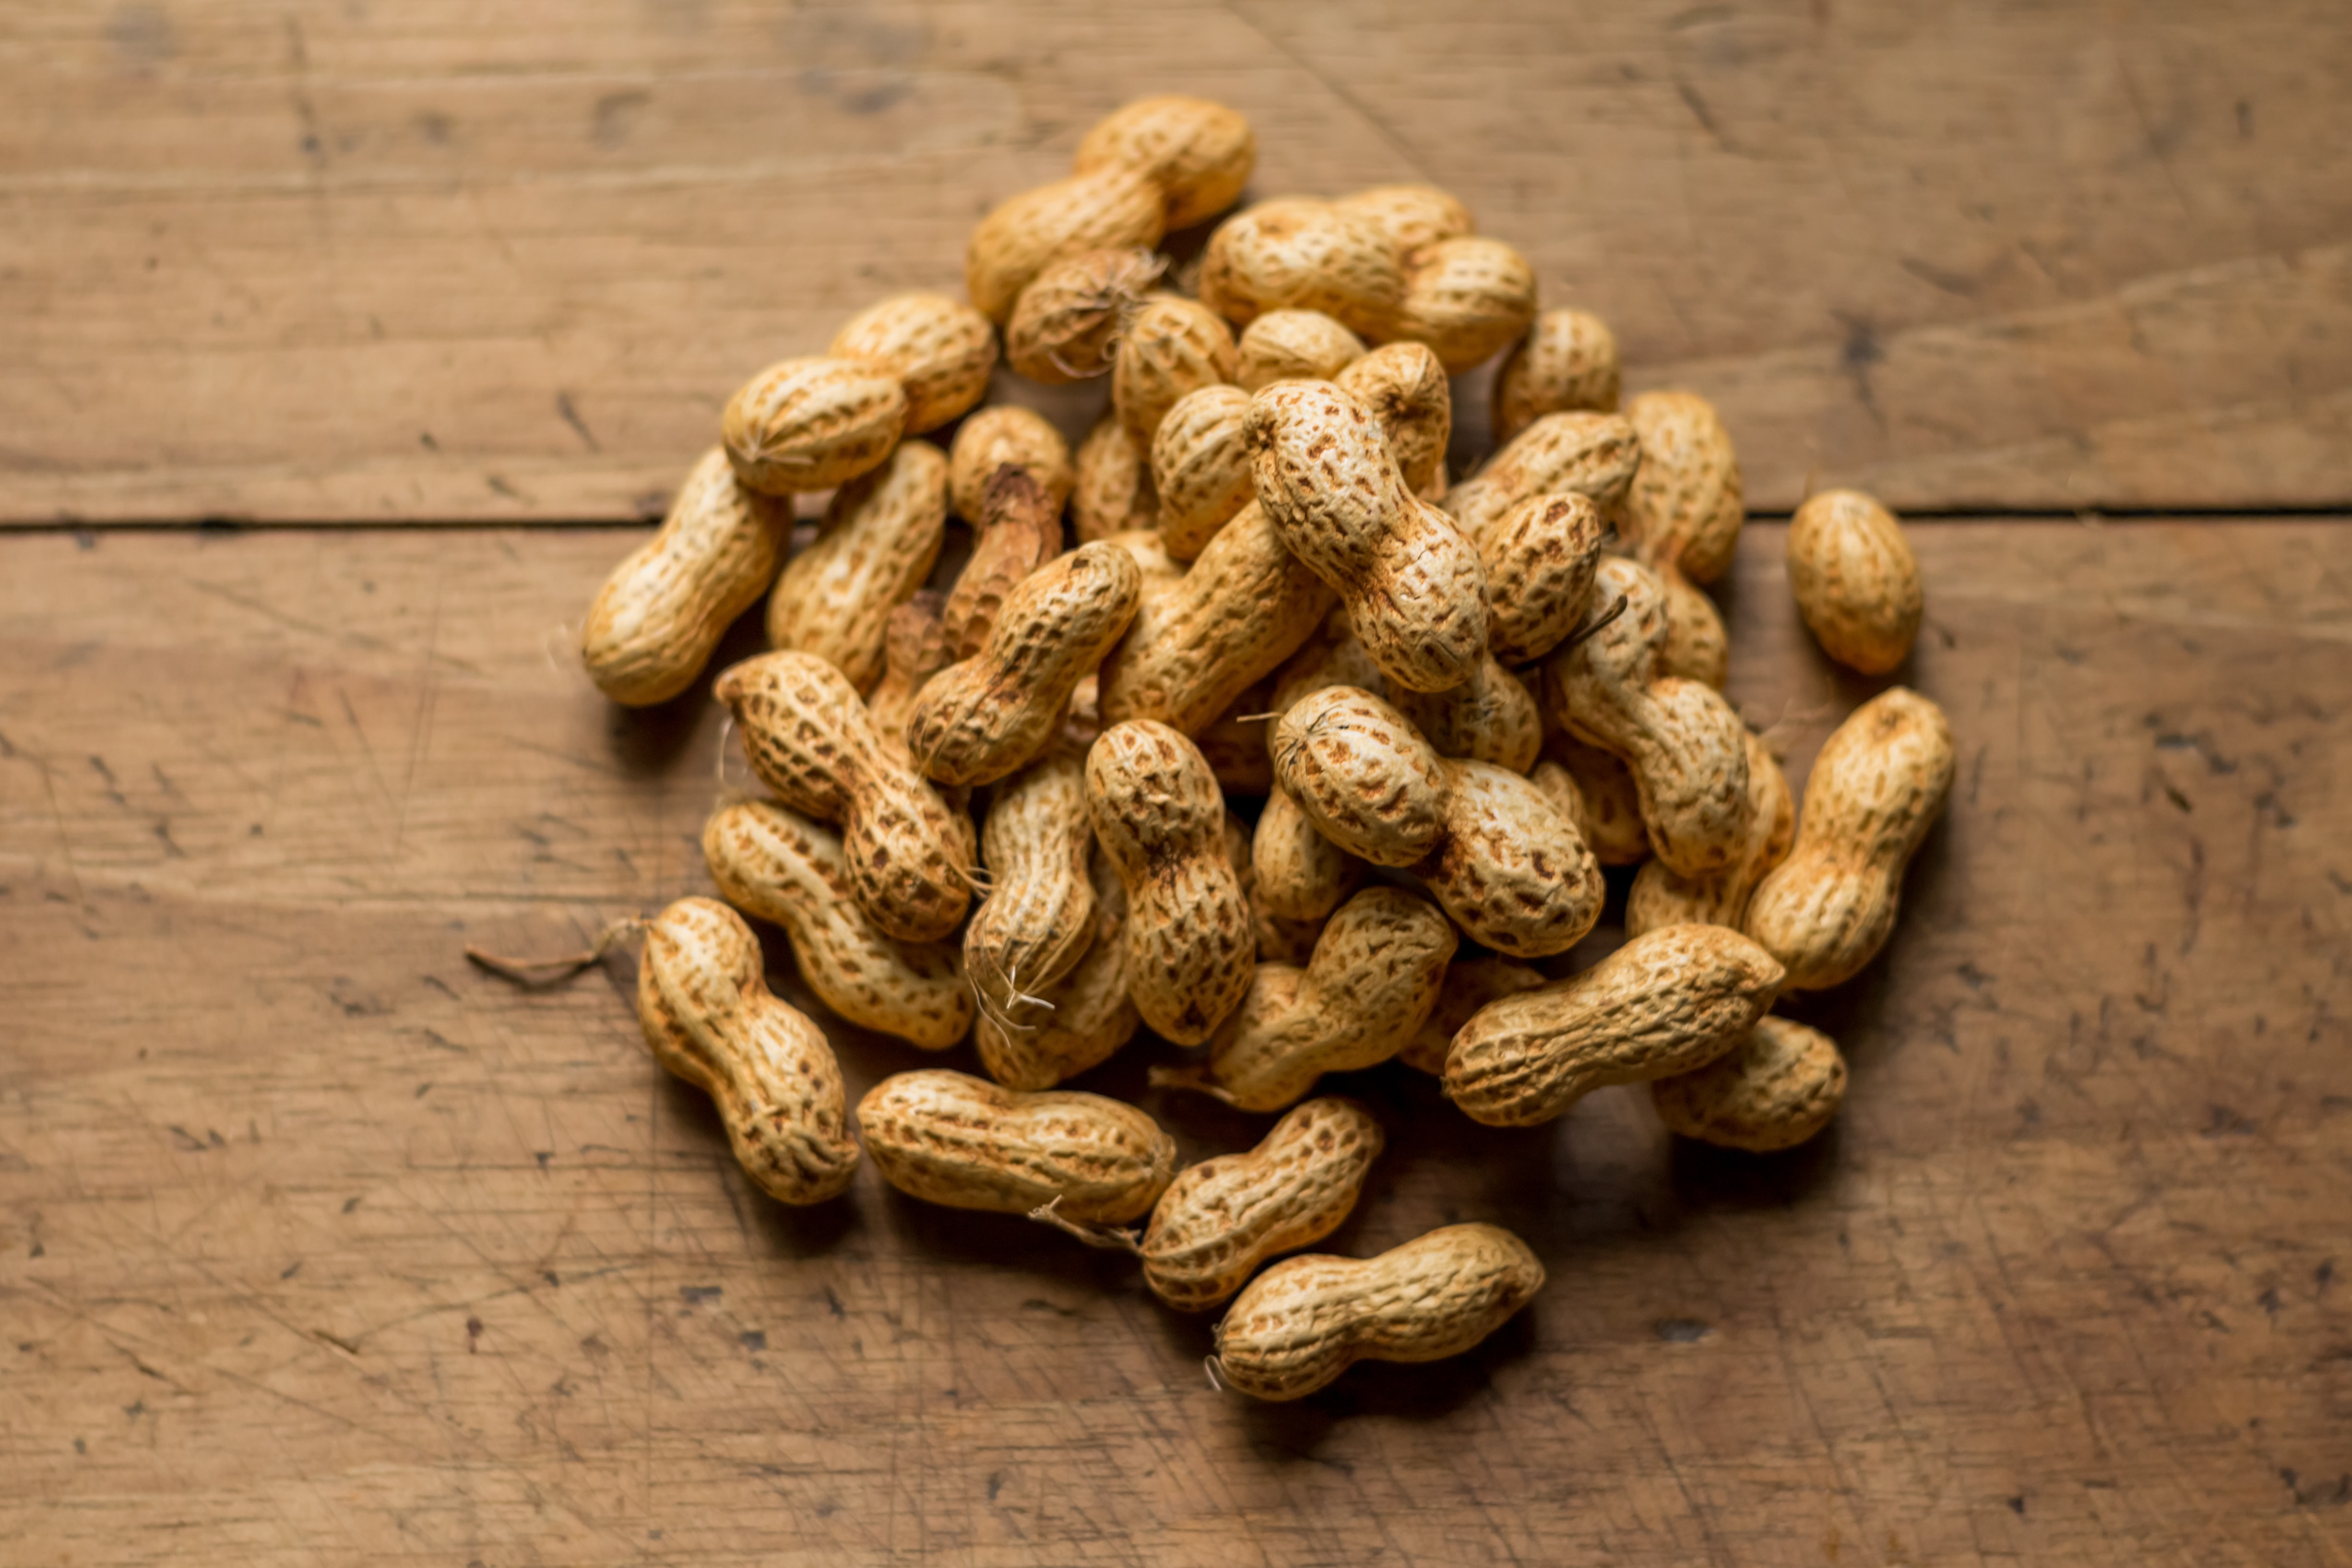 Peanuts Geringfügigkeit § 153 StPO